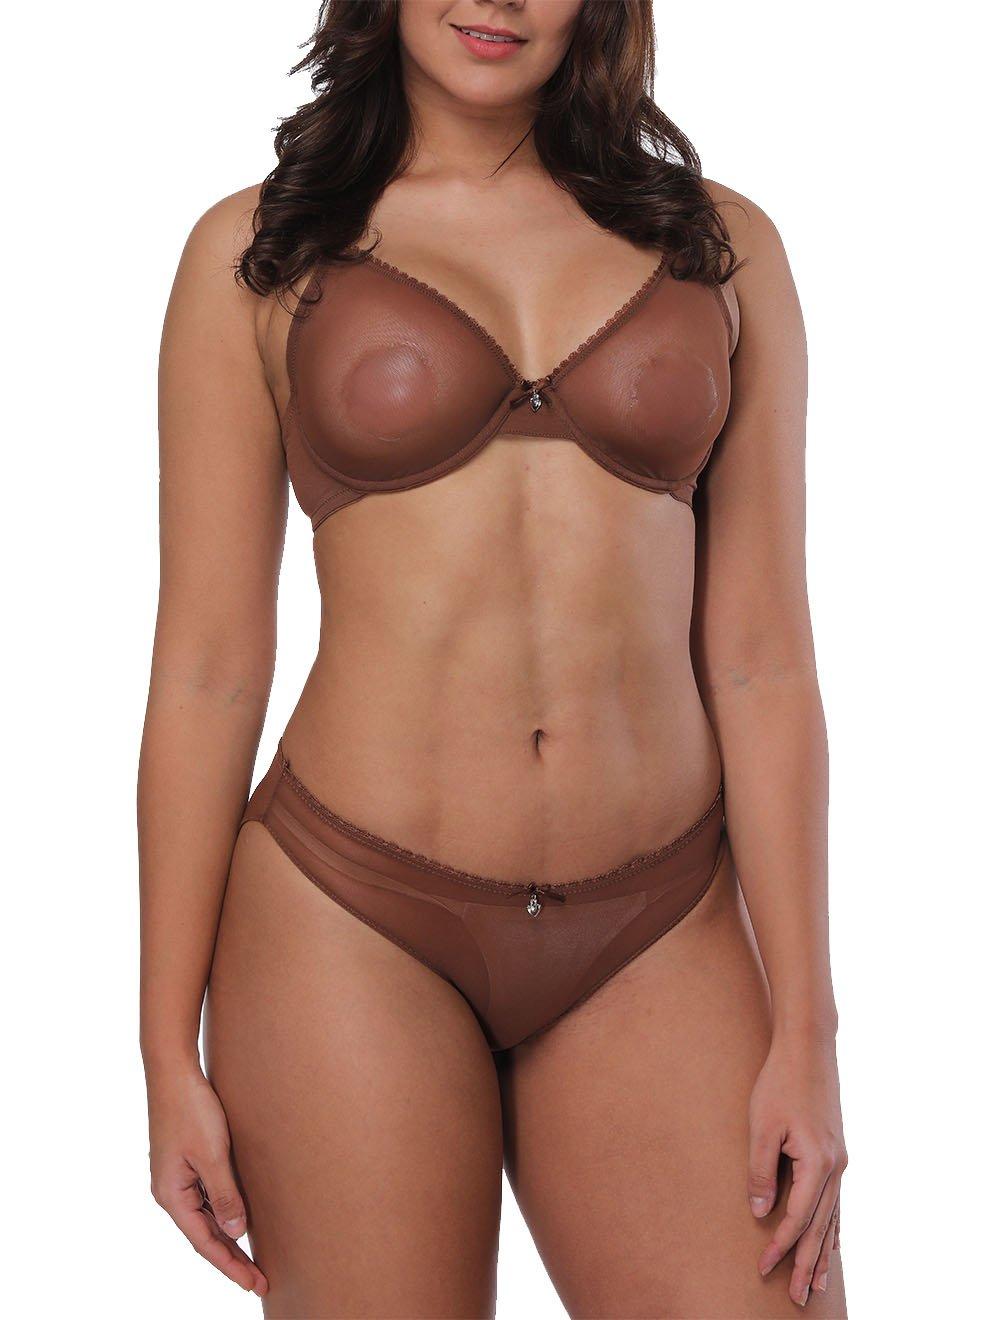 79b35e03d9 YANDW Women s Sexy Sheer Bra See-Through Mesh Lingerie Lace Bralette  Transparent Everyday Bra